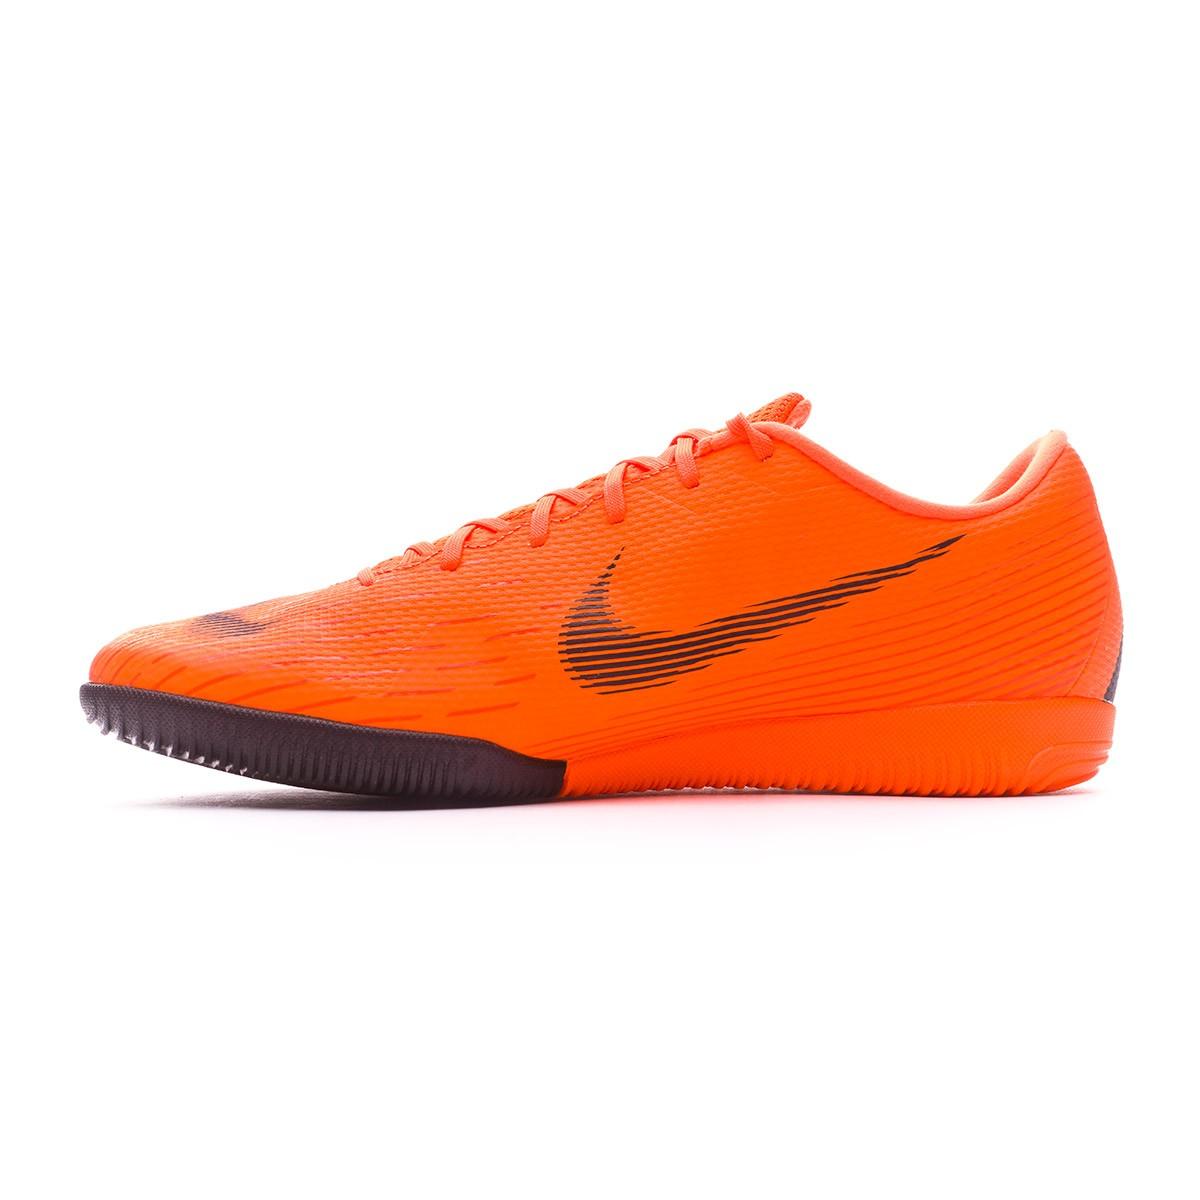 ... Zapatilla Mercurial VaporX XII Academy IC Total orange-Black-Volt.  CATEGORY. Futsal 2feb40e333eeb